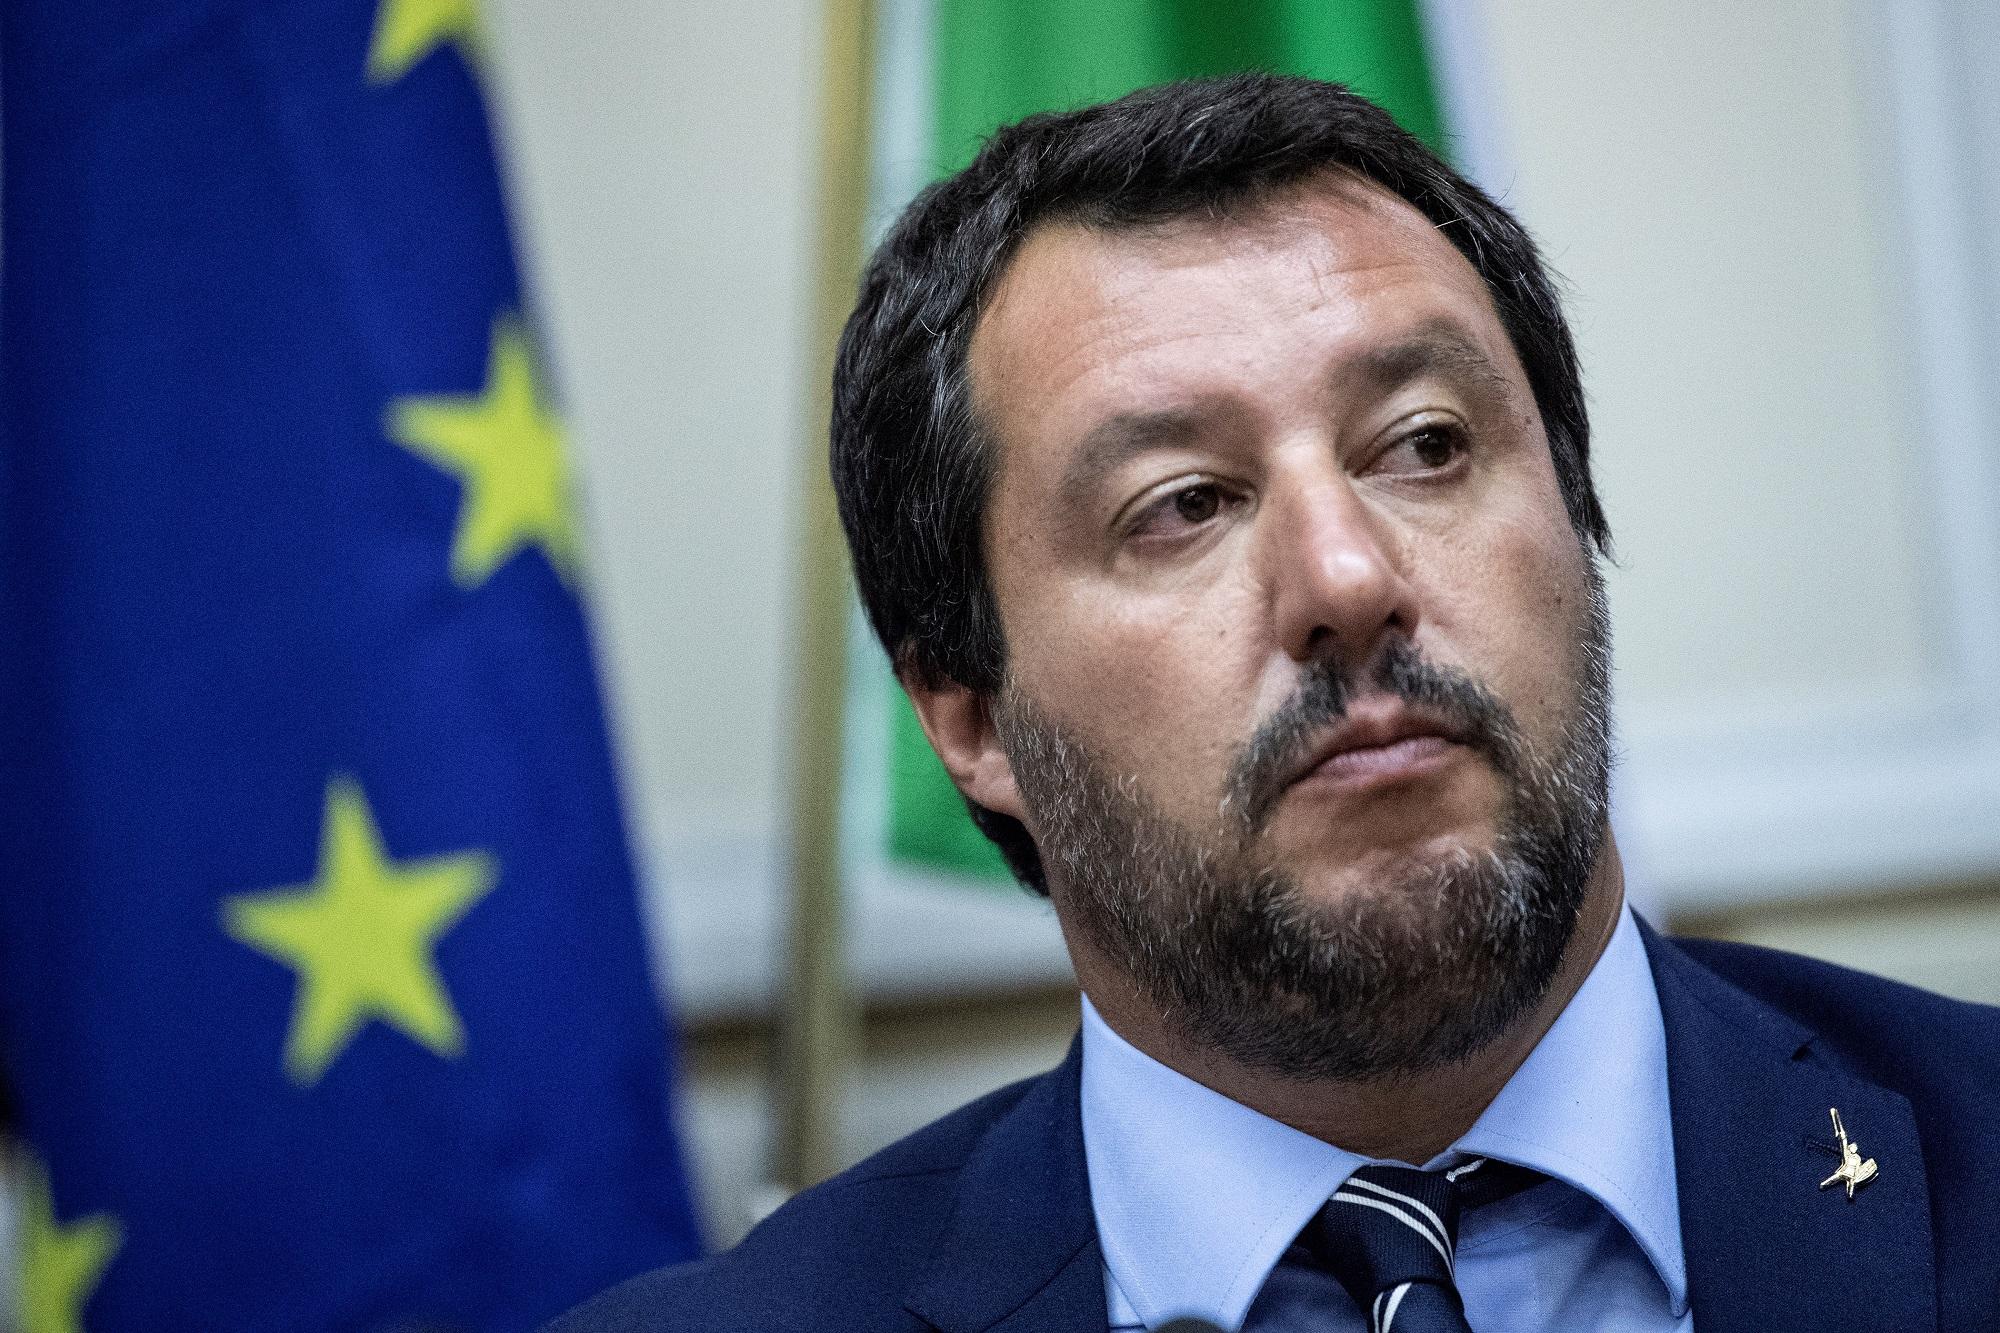 Matteo Salvini, le 28 août 2018 à Milan